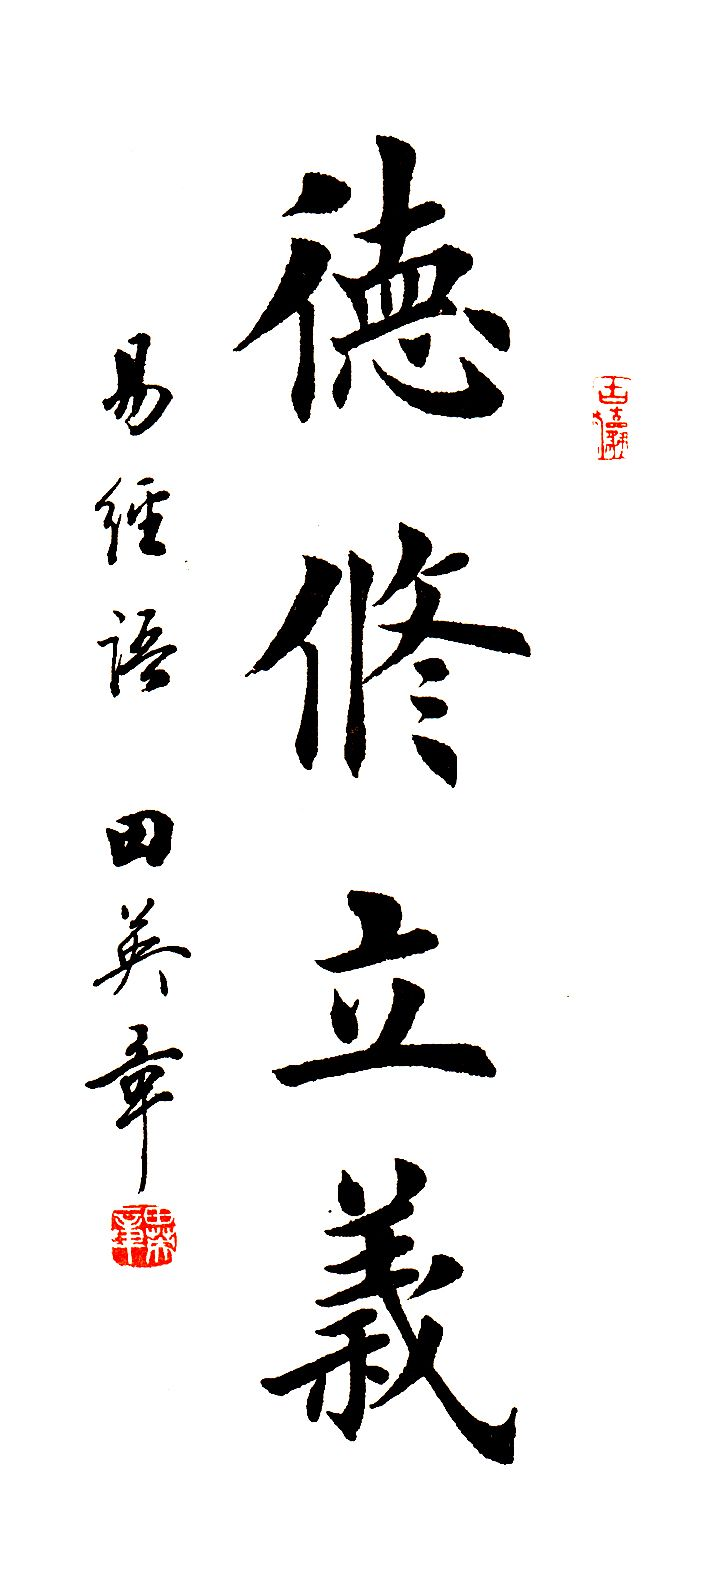 67 best japanese calligraphy and prints images on pinterest 4 buycottarizona Choice Image